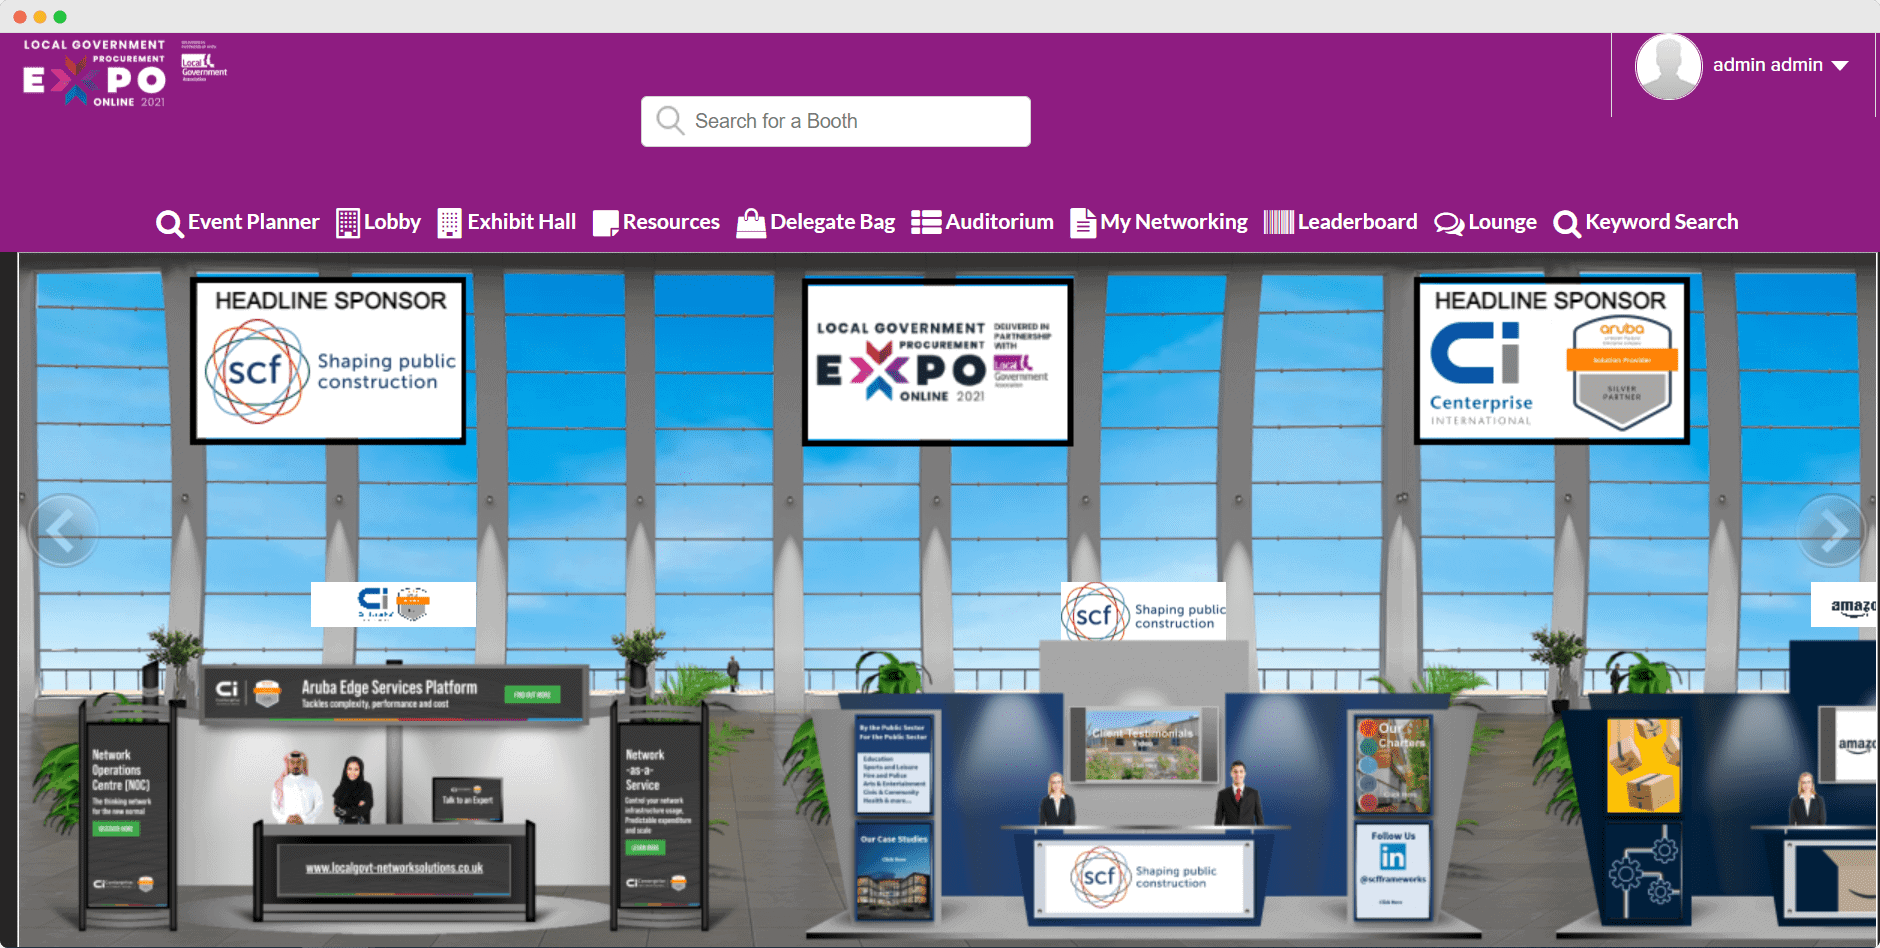 BiP virtual events exhibit hall